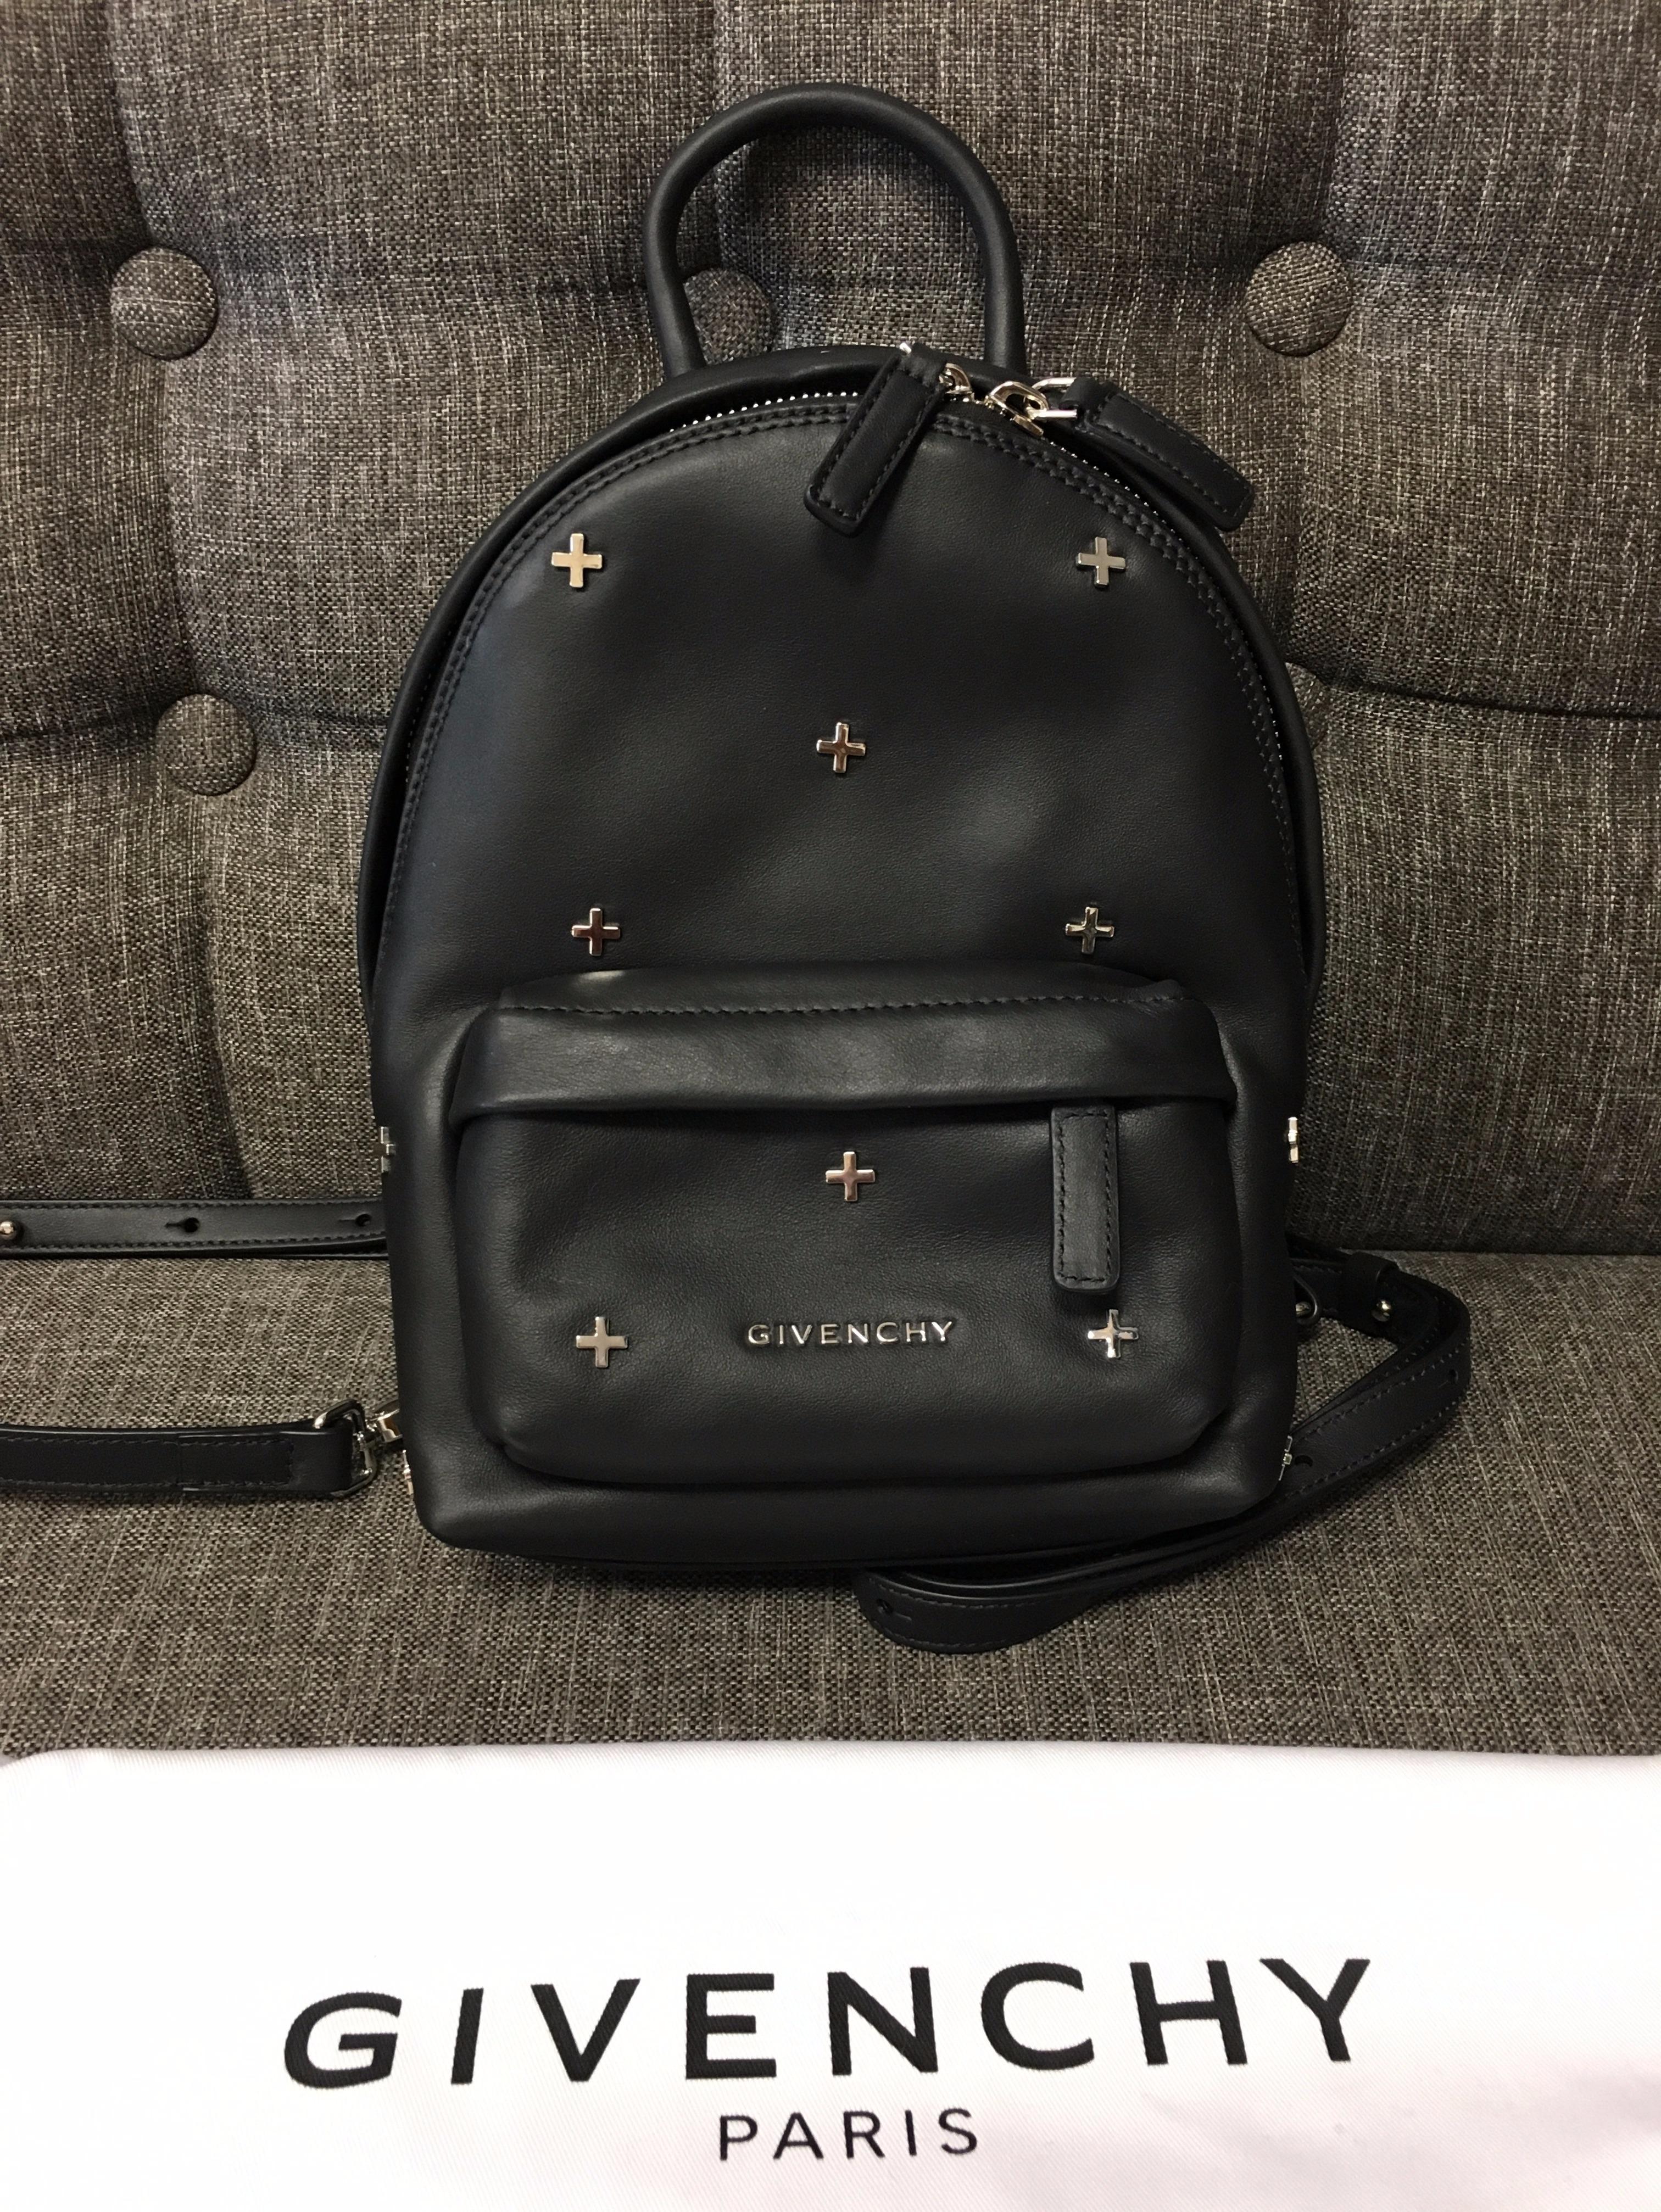 ea41b11f17d9 Купить рюкзак Givenchy за 48000 руб. в интернет магазине - бутике с ...